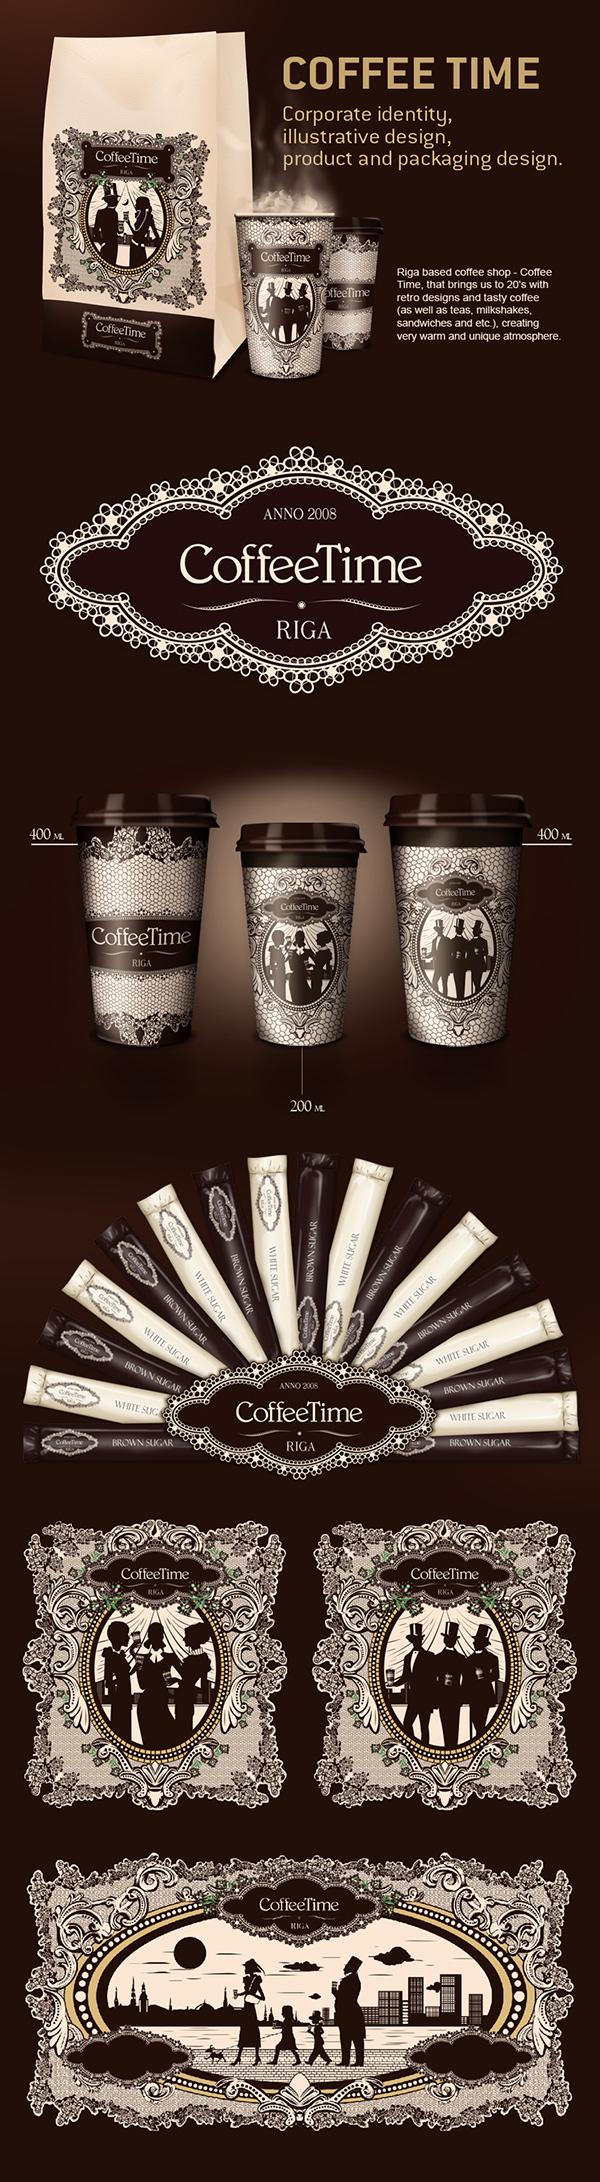 Coffee Coffee time coffee packaging coffee brand retro style coffee illustrations Sergio Laskin Studio43